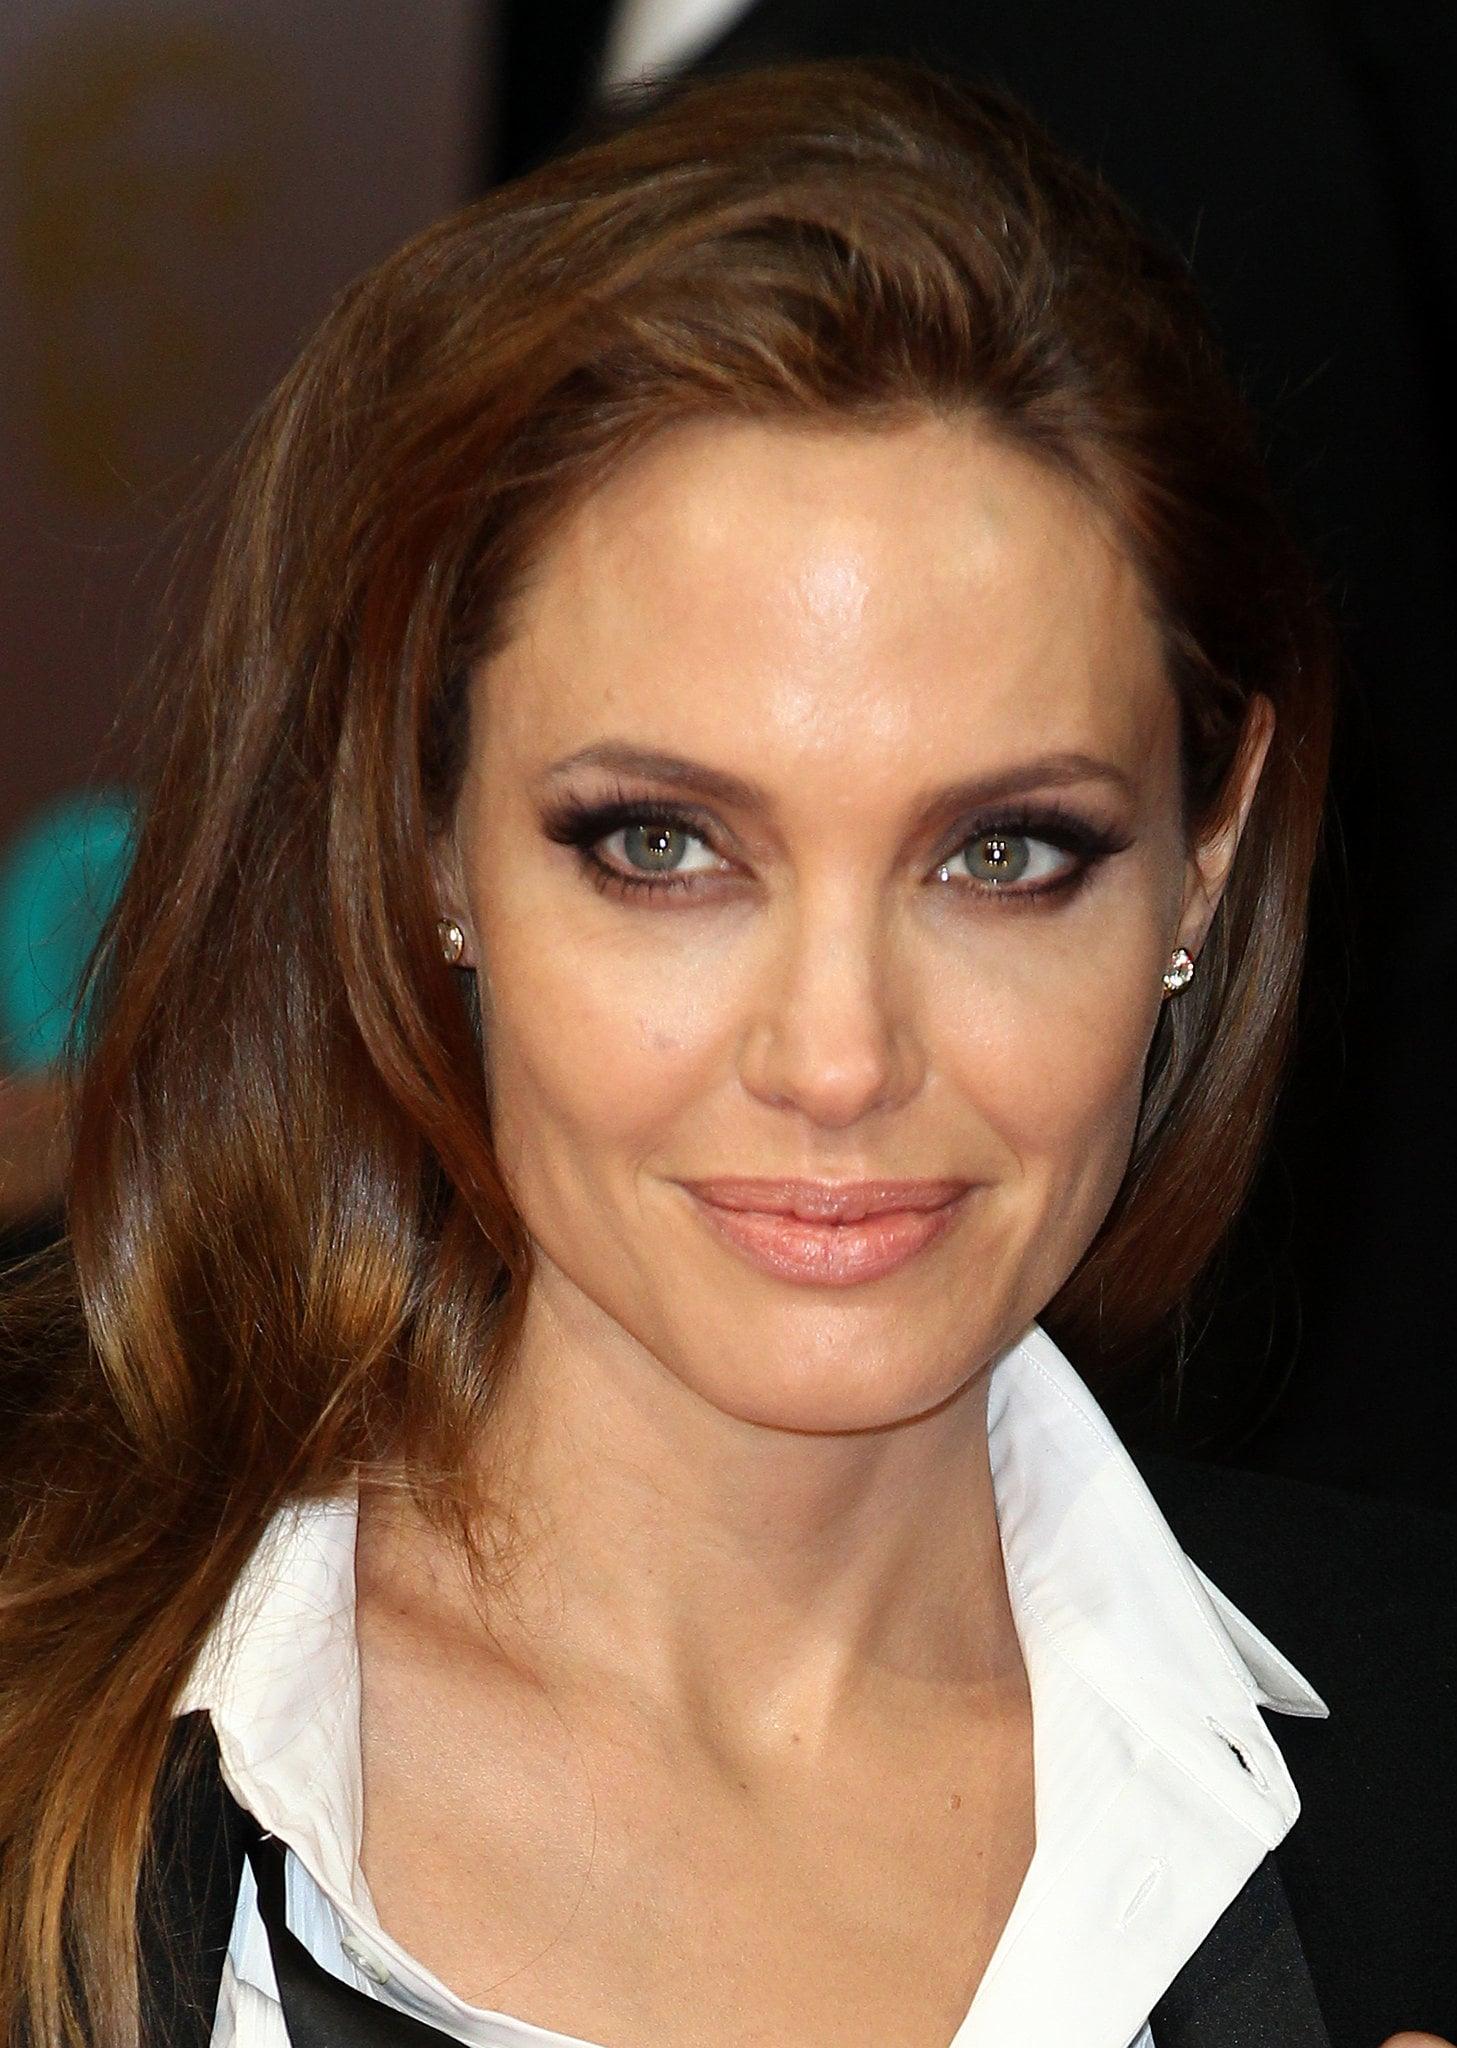 Angelina Jolie's BAFTA Look